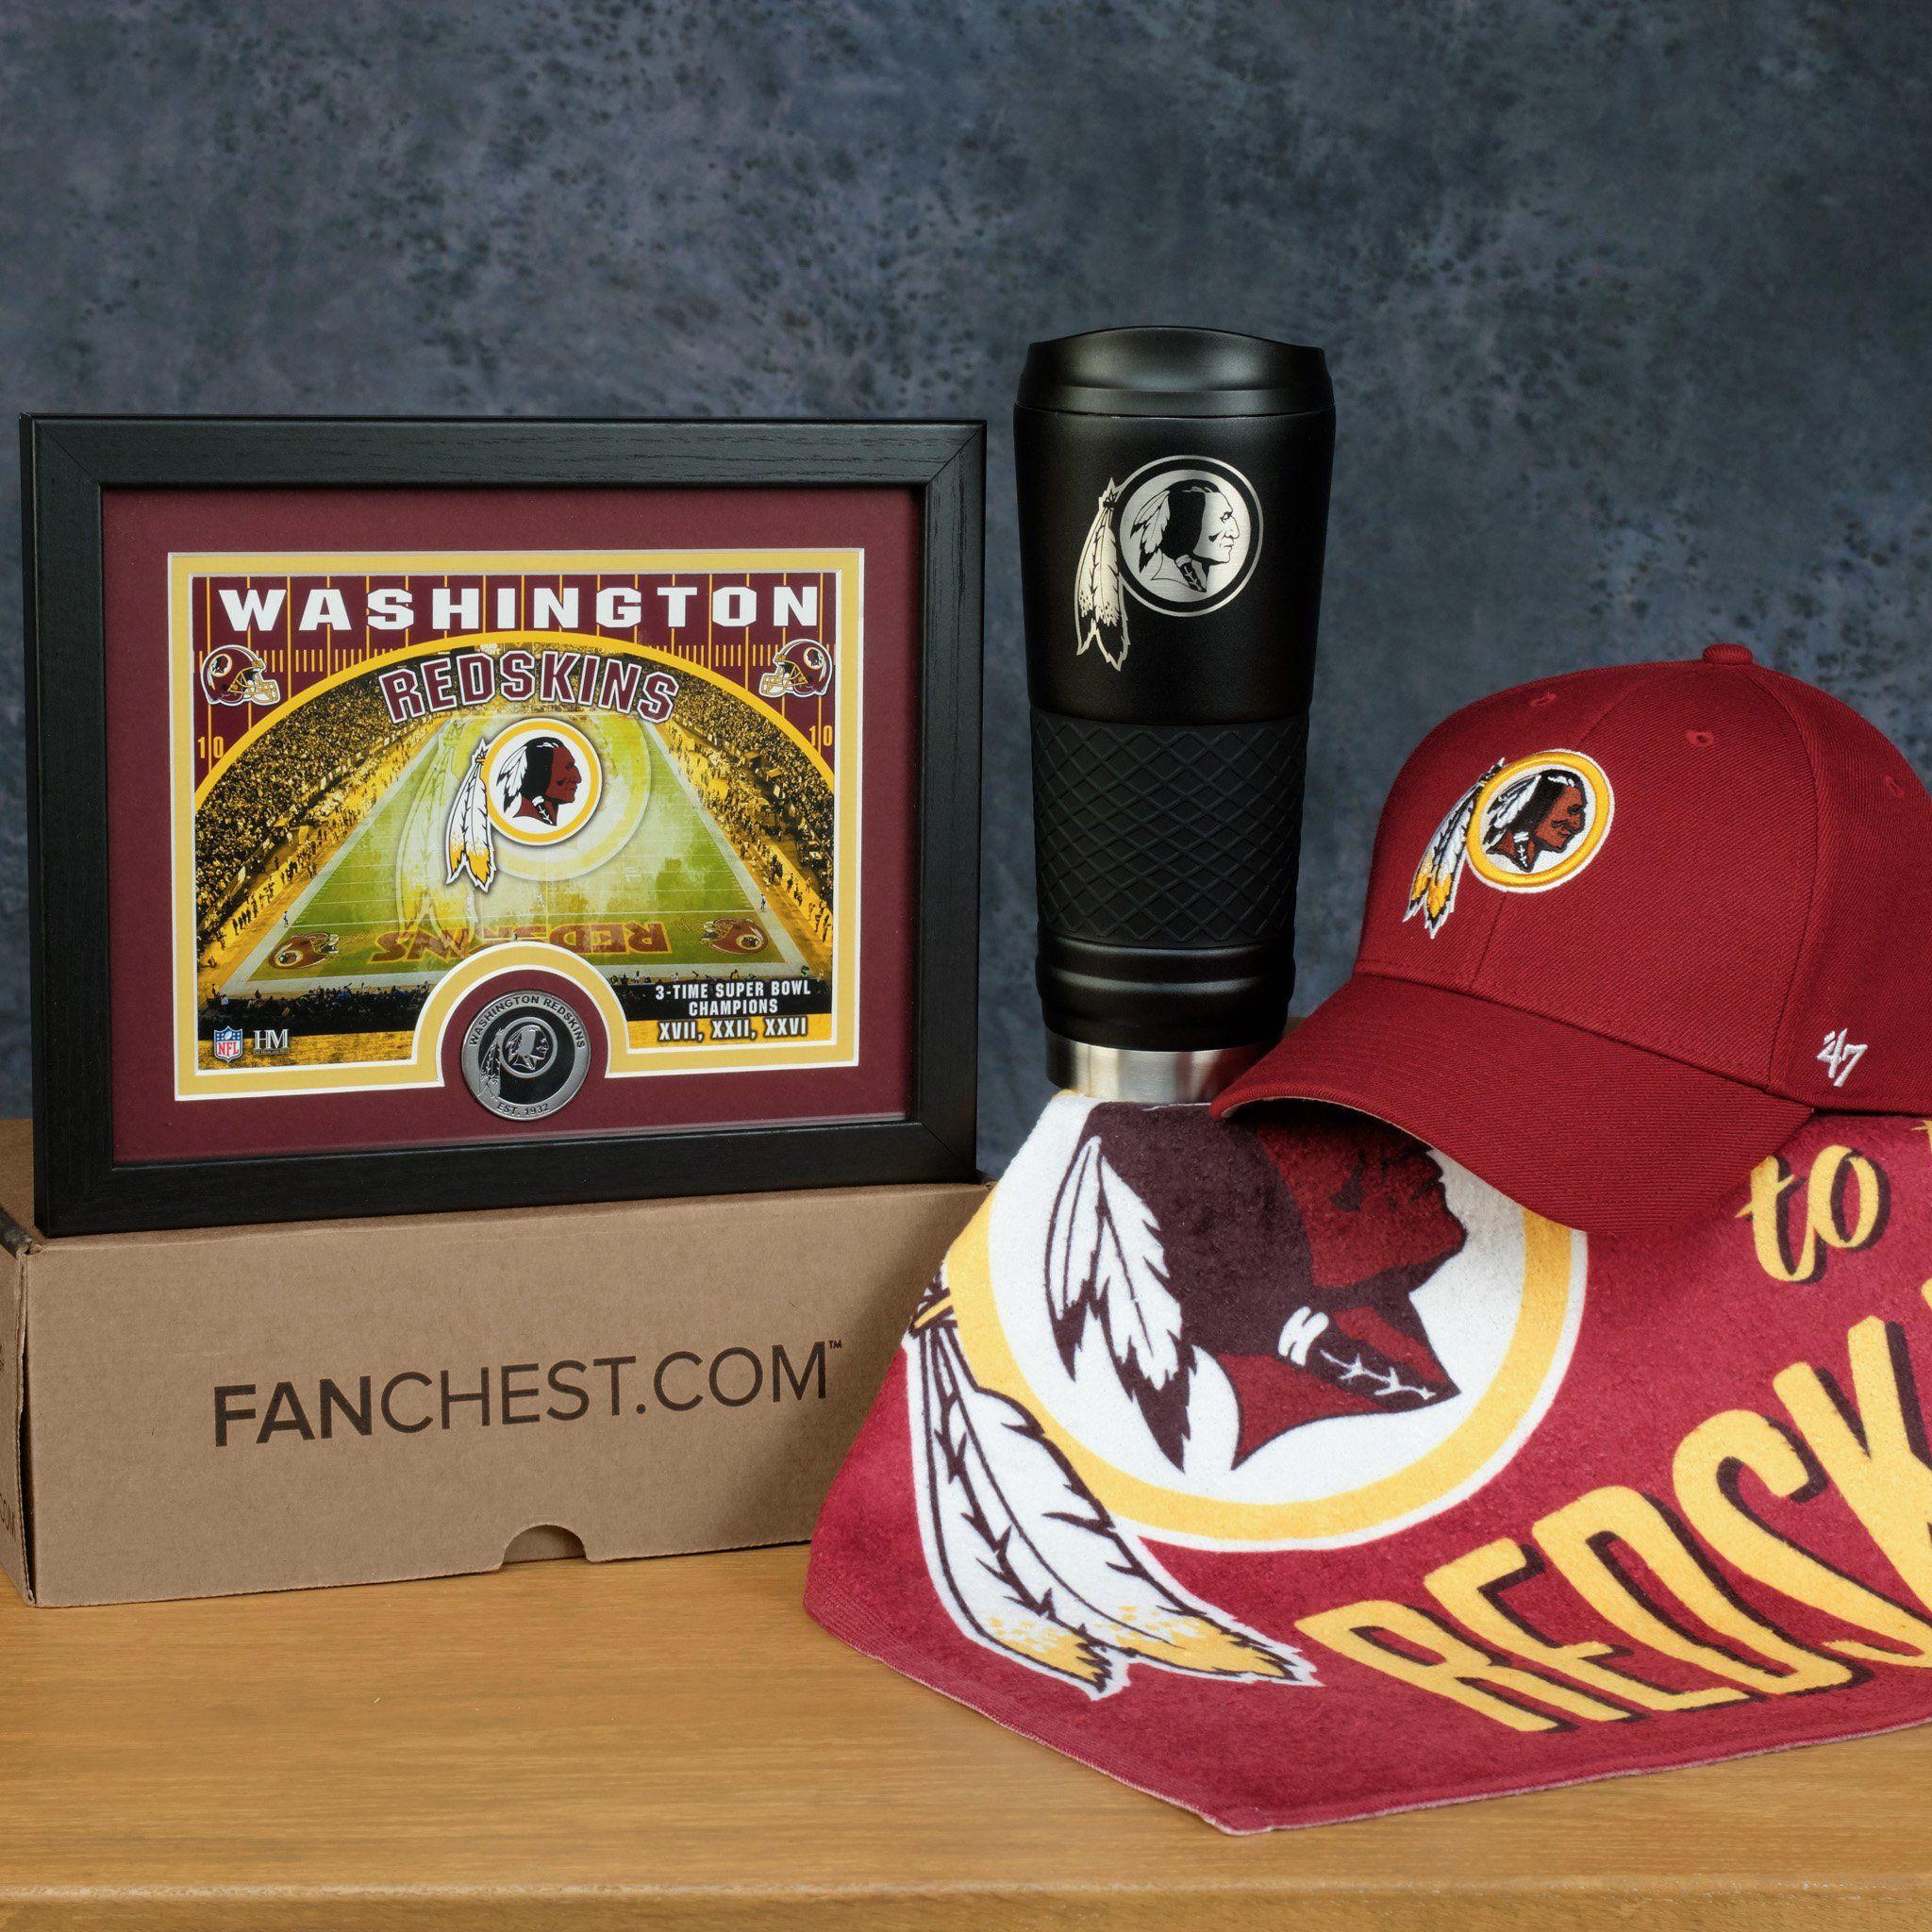 9421acd2 Washington Redskins FANCHEST Deluxe in 2019   Washington Redskins ...